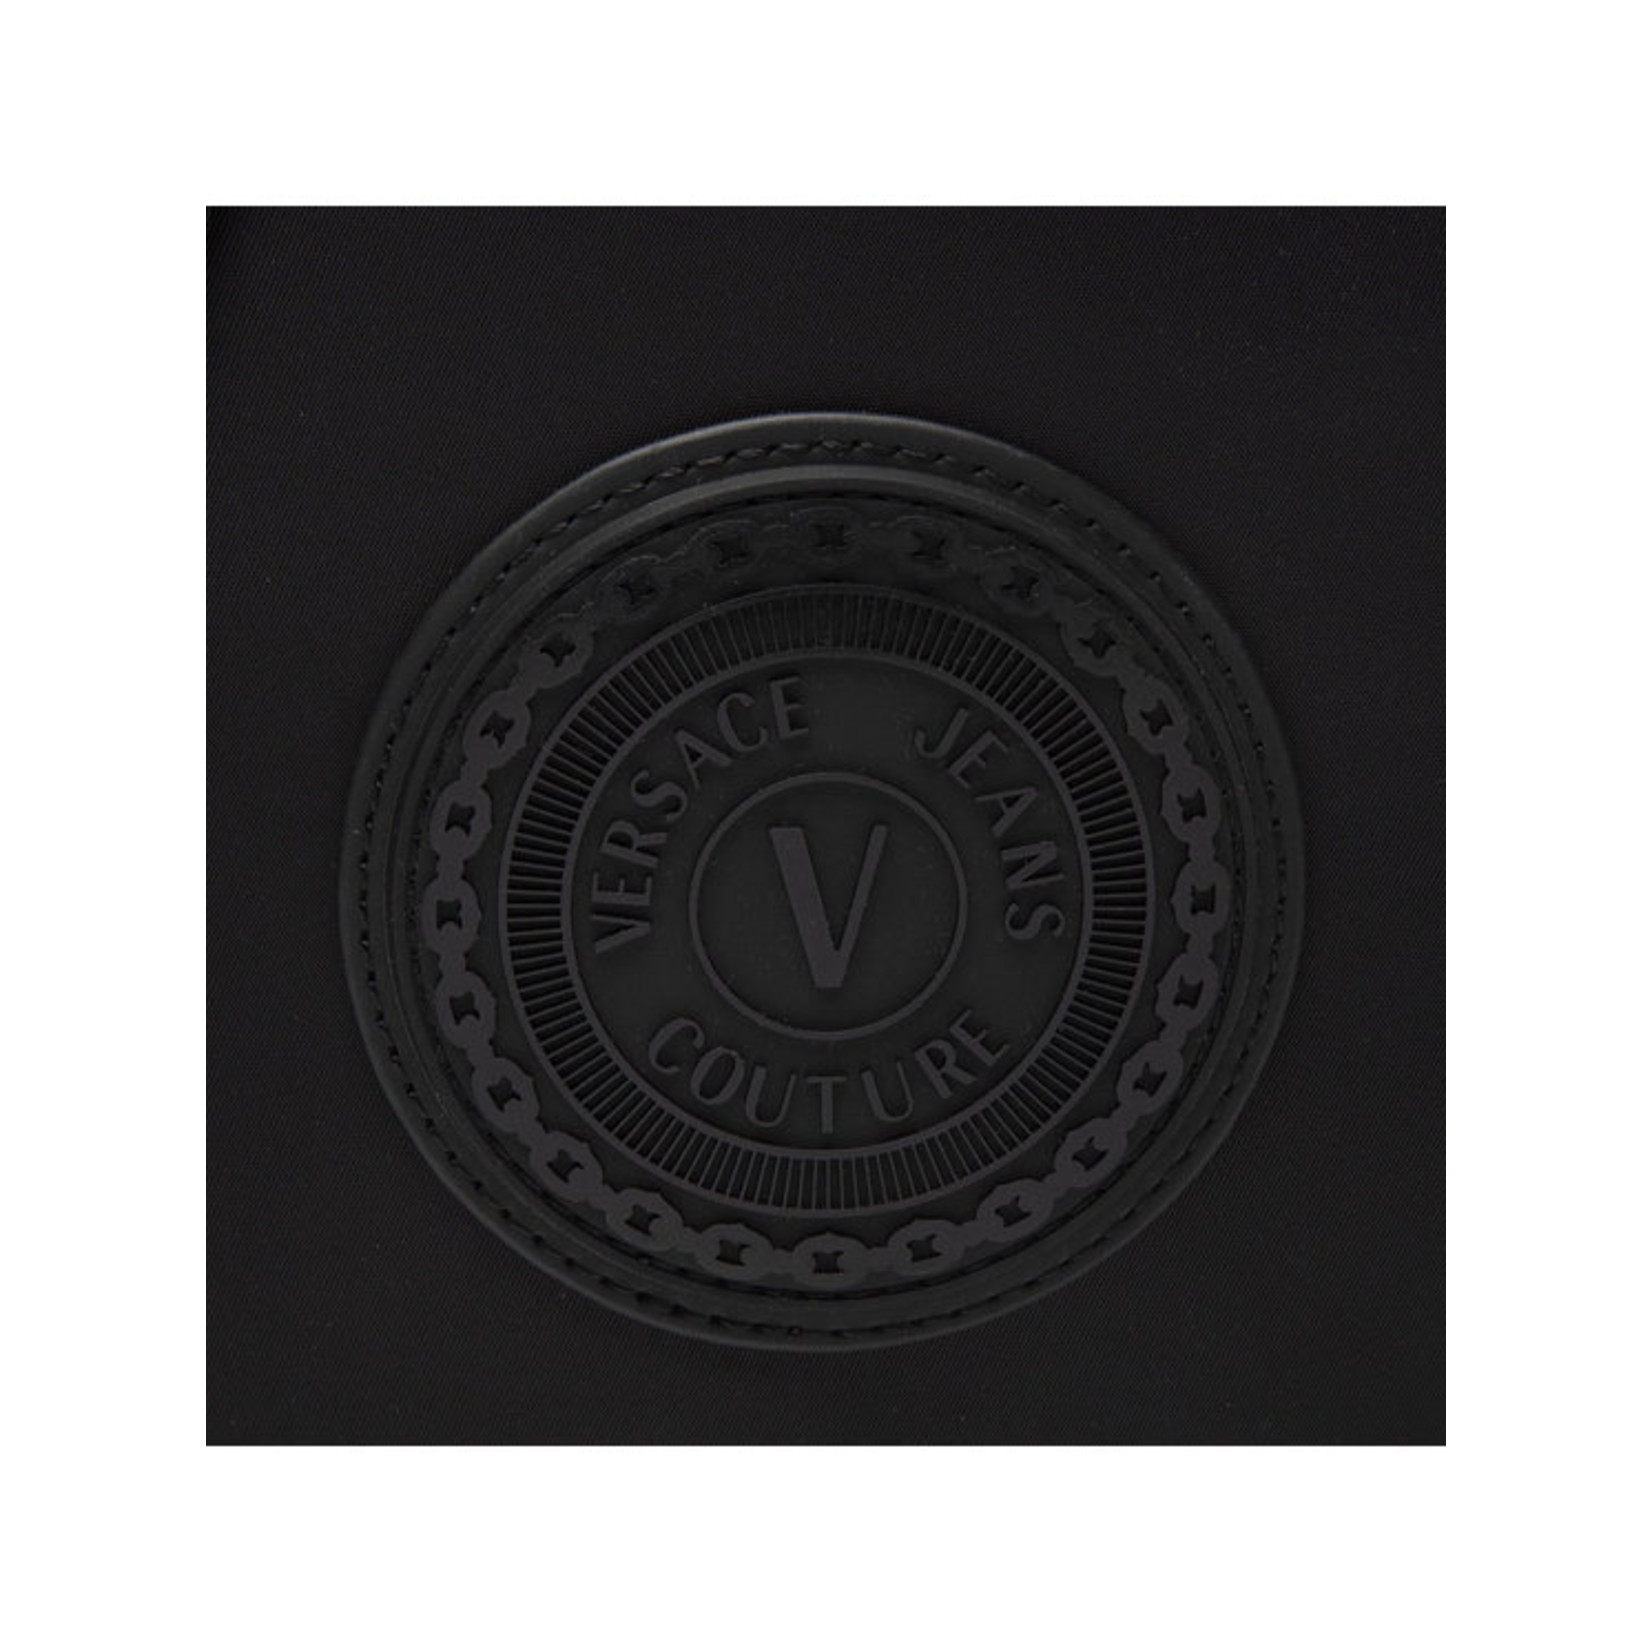 VERSACE JEANS COUTURE VERSACE JEANS COUTURE - CROSS BODY 71YA4B15 - BLACK